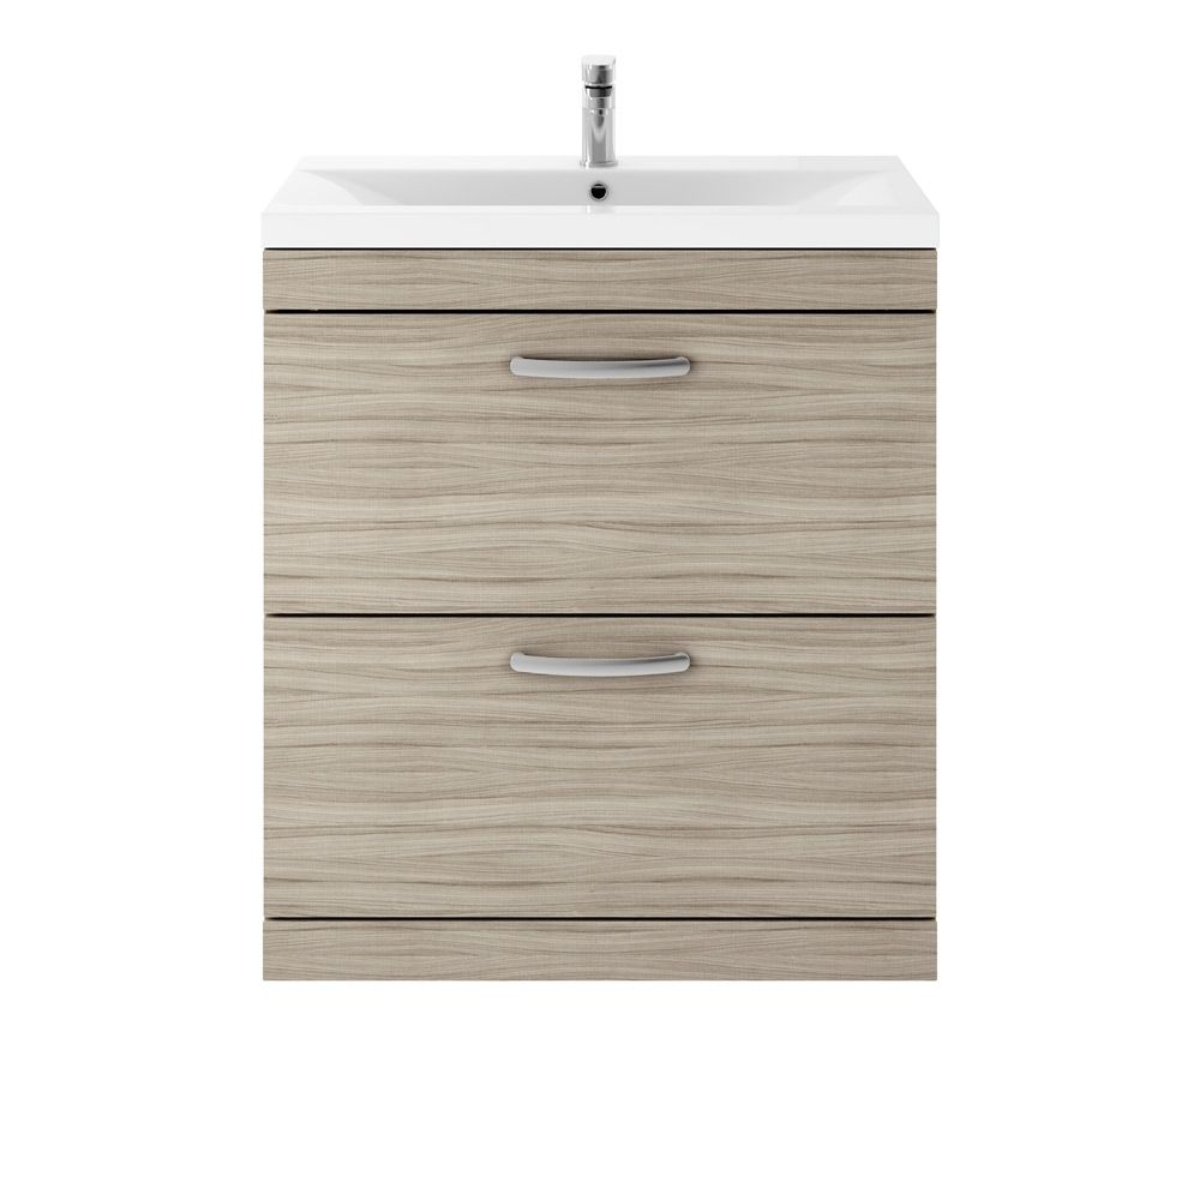 Premier Athena Driftwood 2 Drawer Floor Standing Vanity Unit 800mm